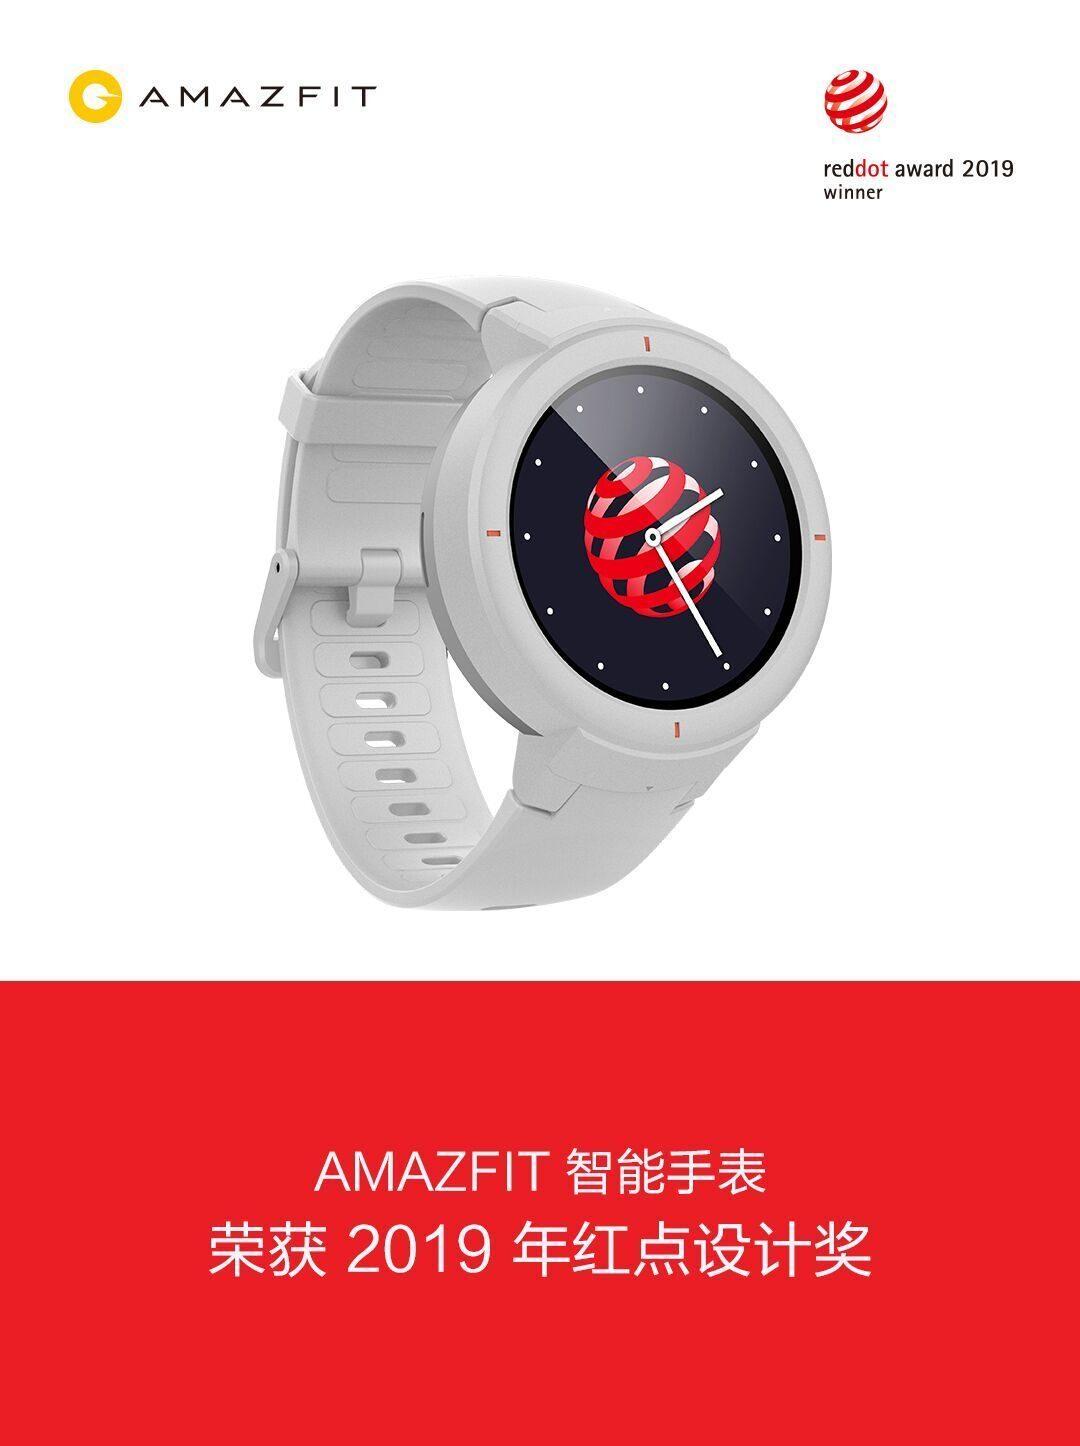 Amazfit 智能手表获得德国红点设计奖 创新设计再获国际认可!